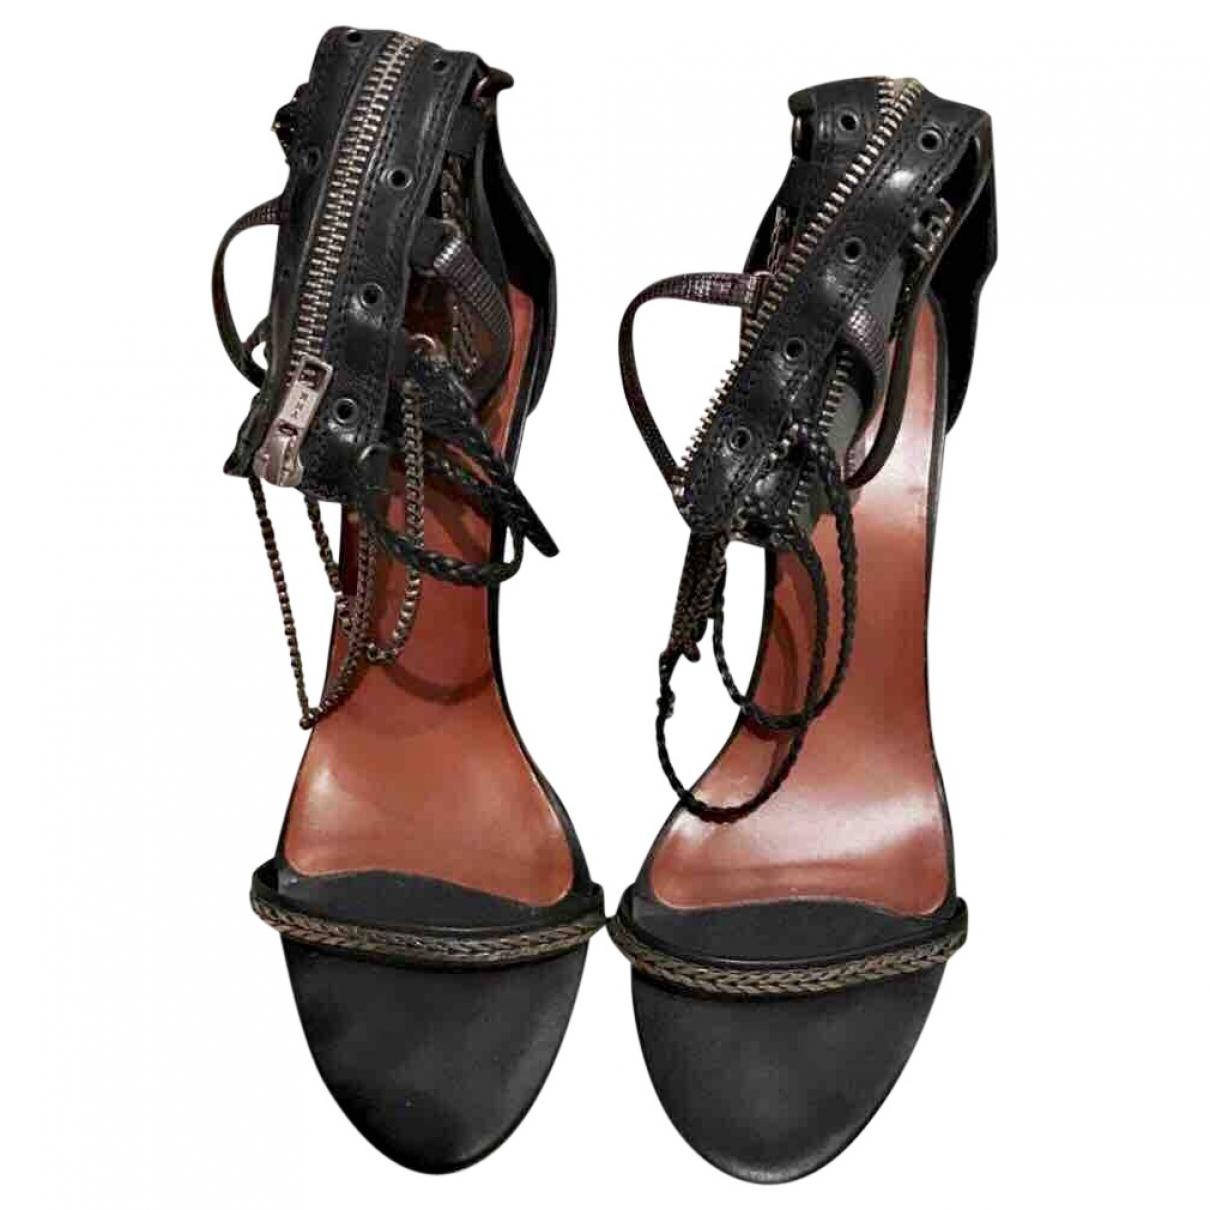 Isabel Marant \N Black Leather Sandals for Women 39 EU